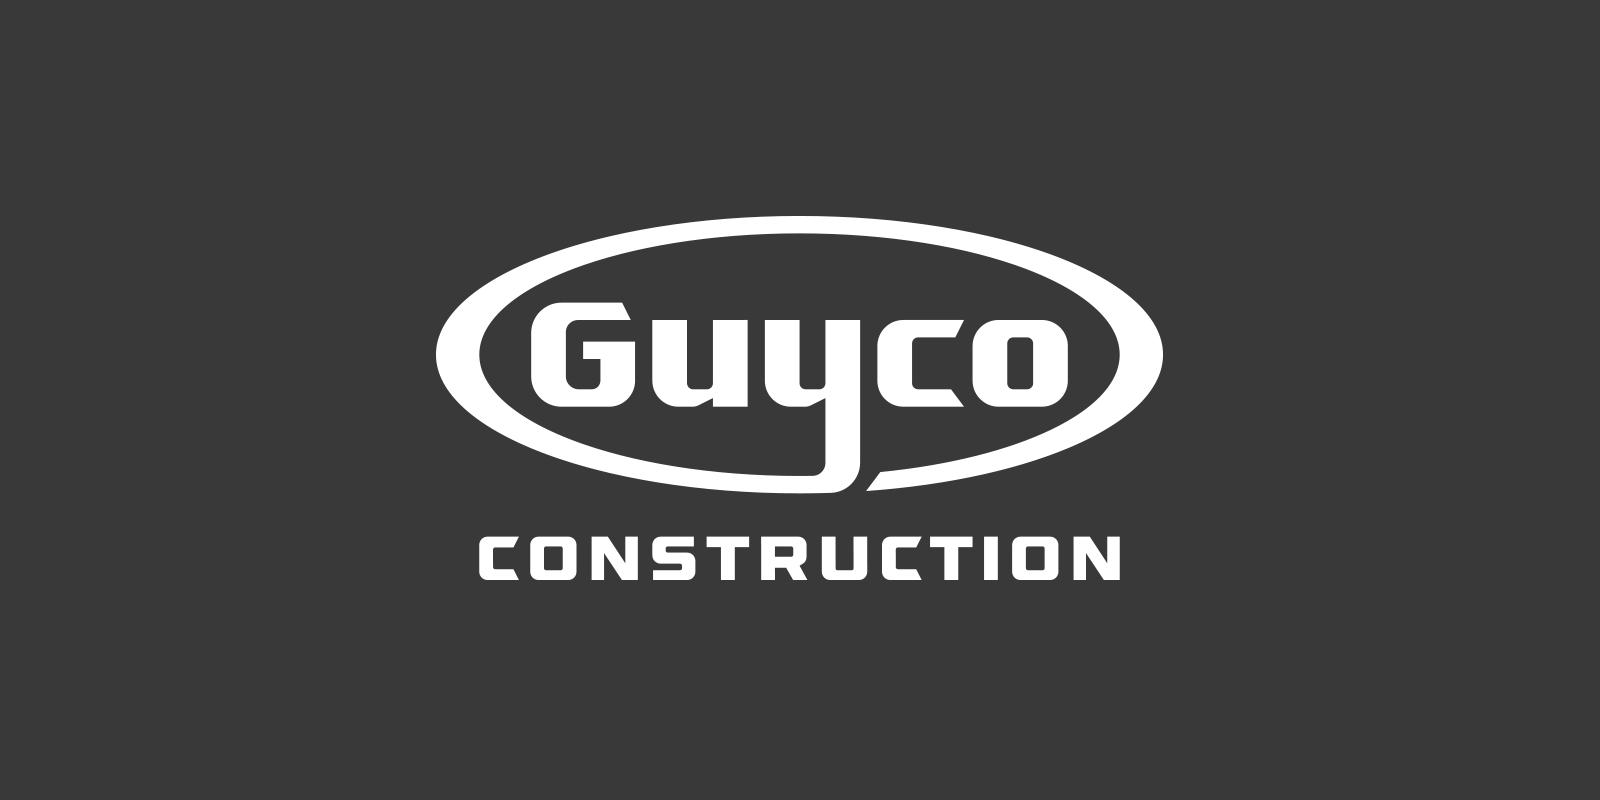 Construction - Teaser Image